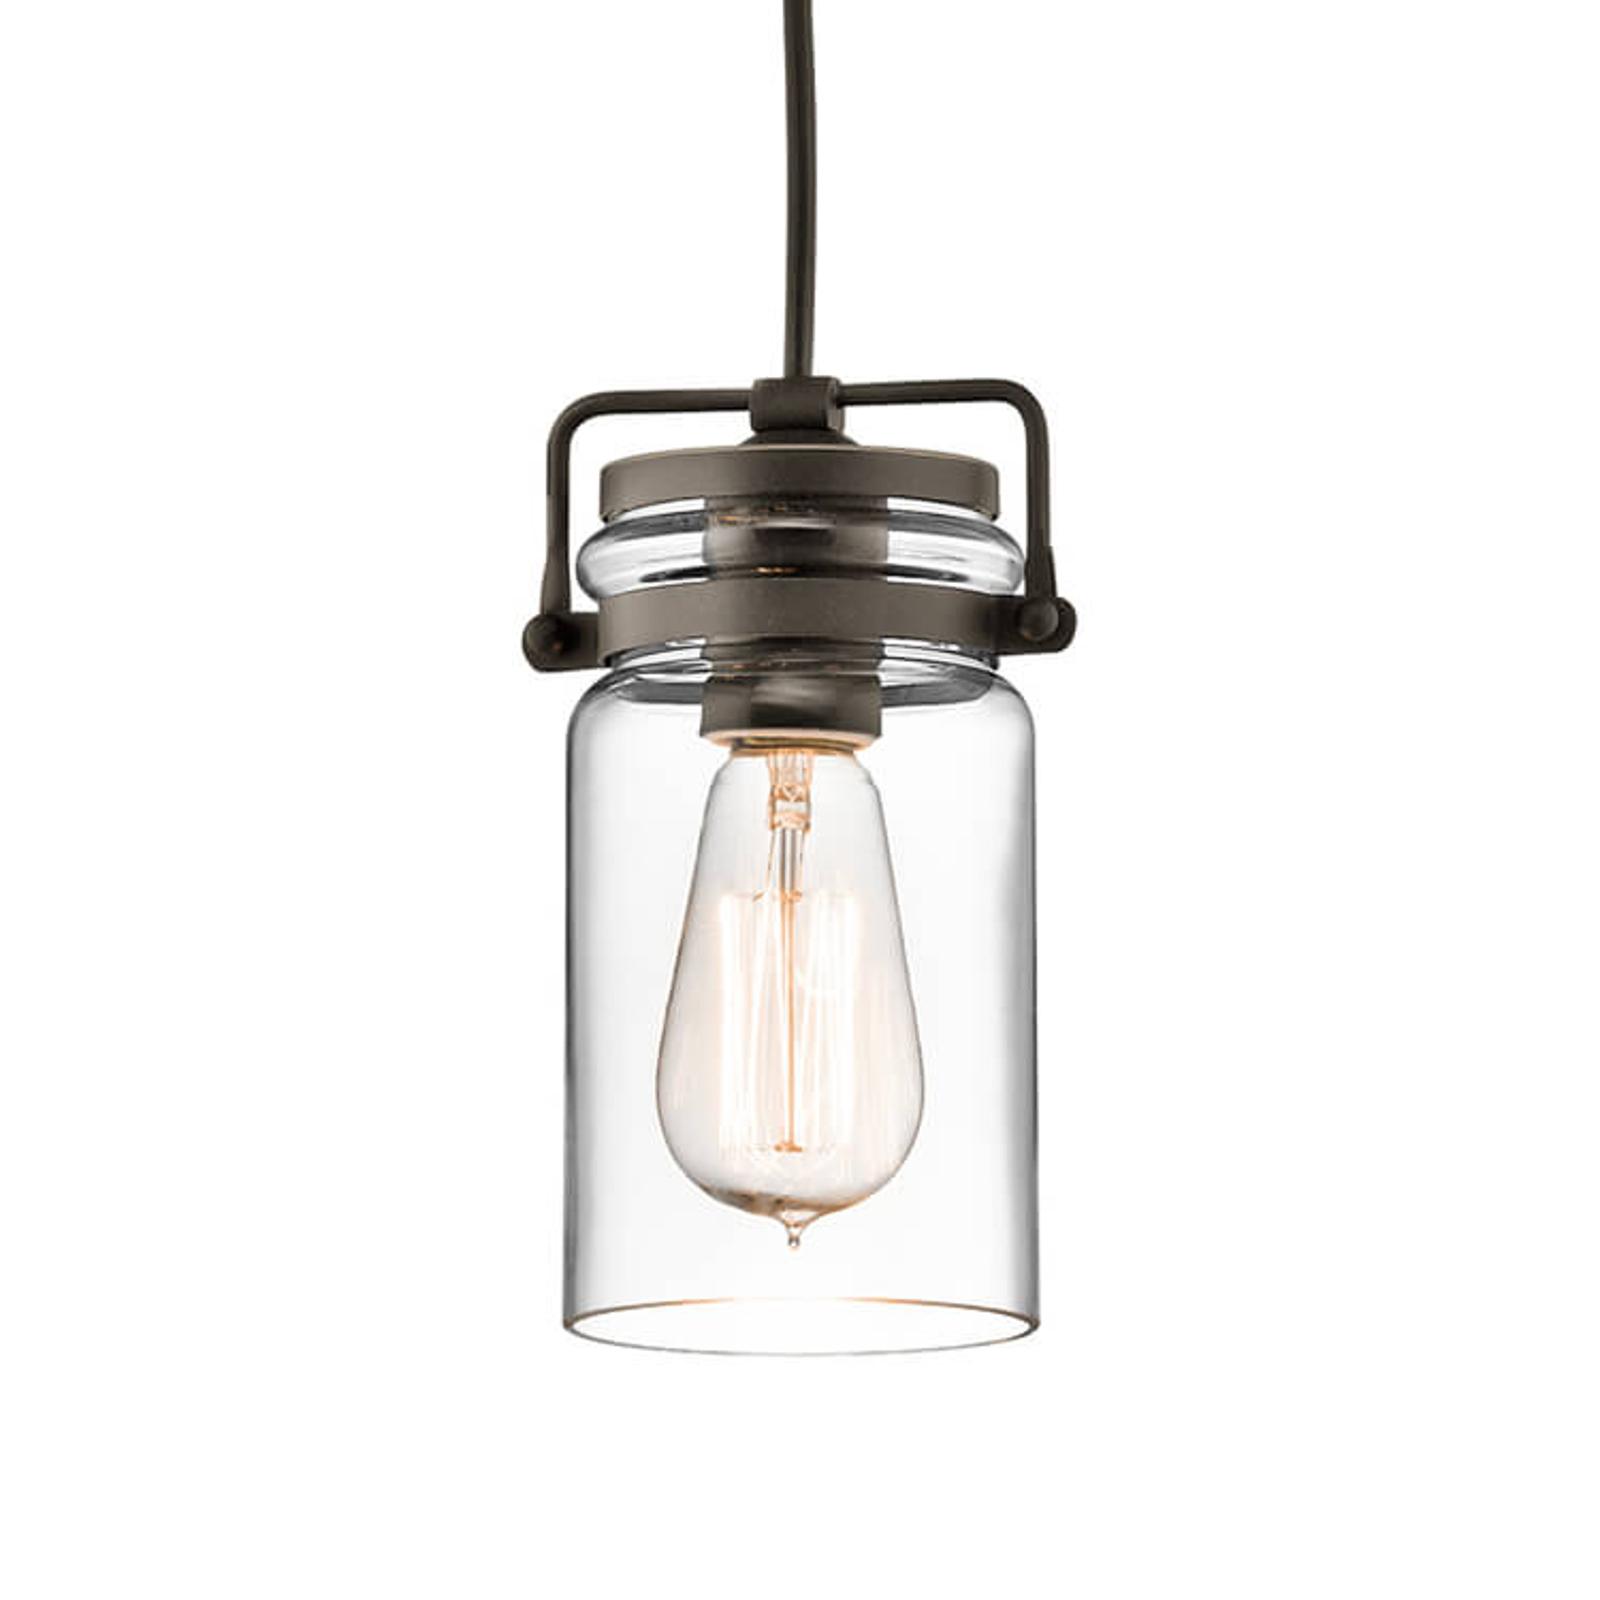 Szklana lampa wisząca Brinley 1-punktowa